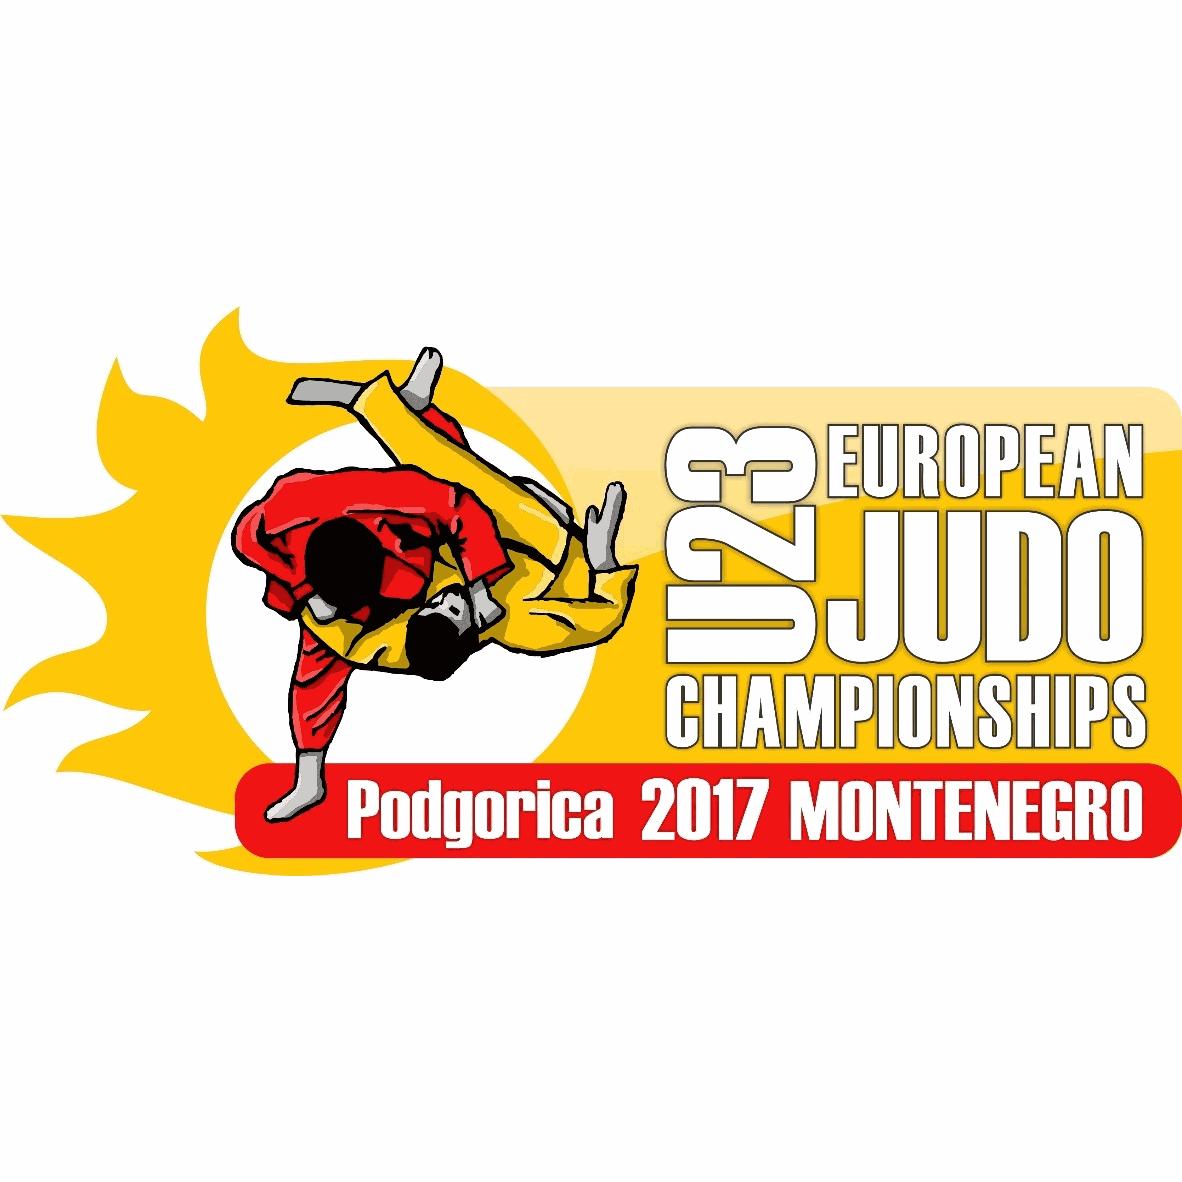 2017 European U23 Judo Championships